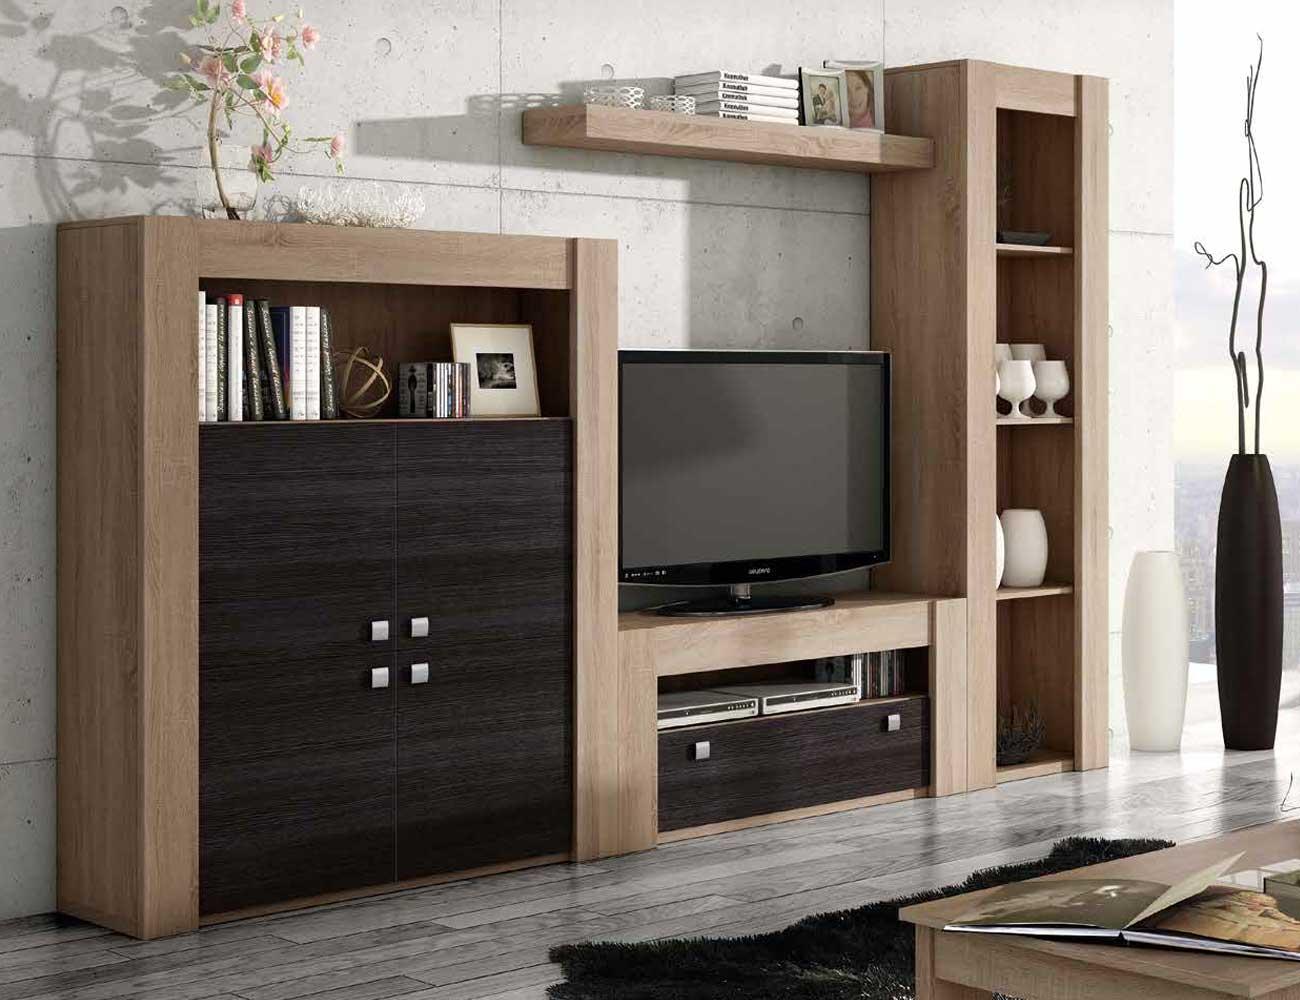 Mueble salon moderno comp03b1